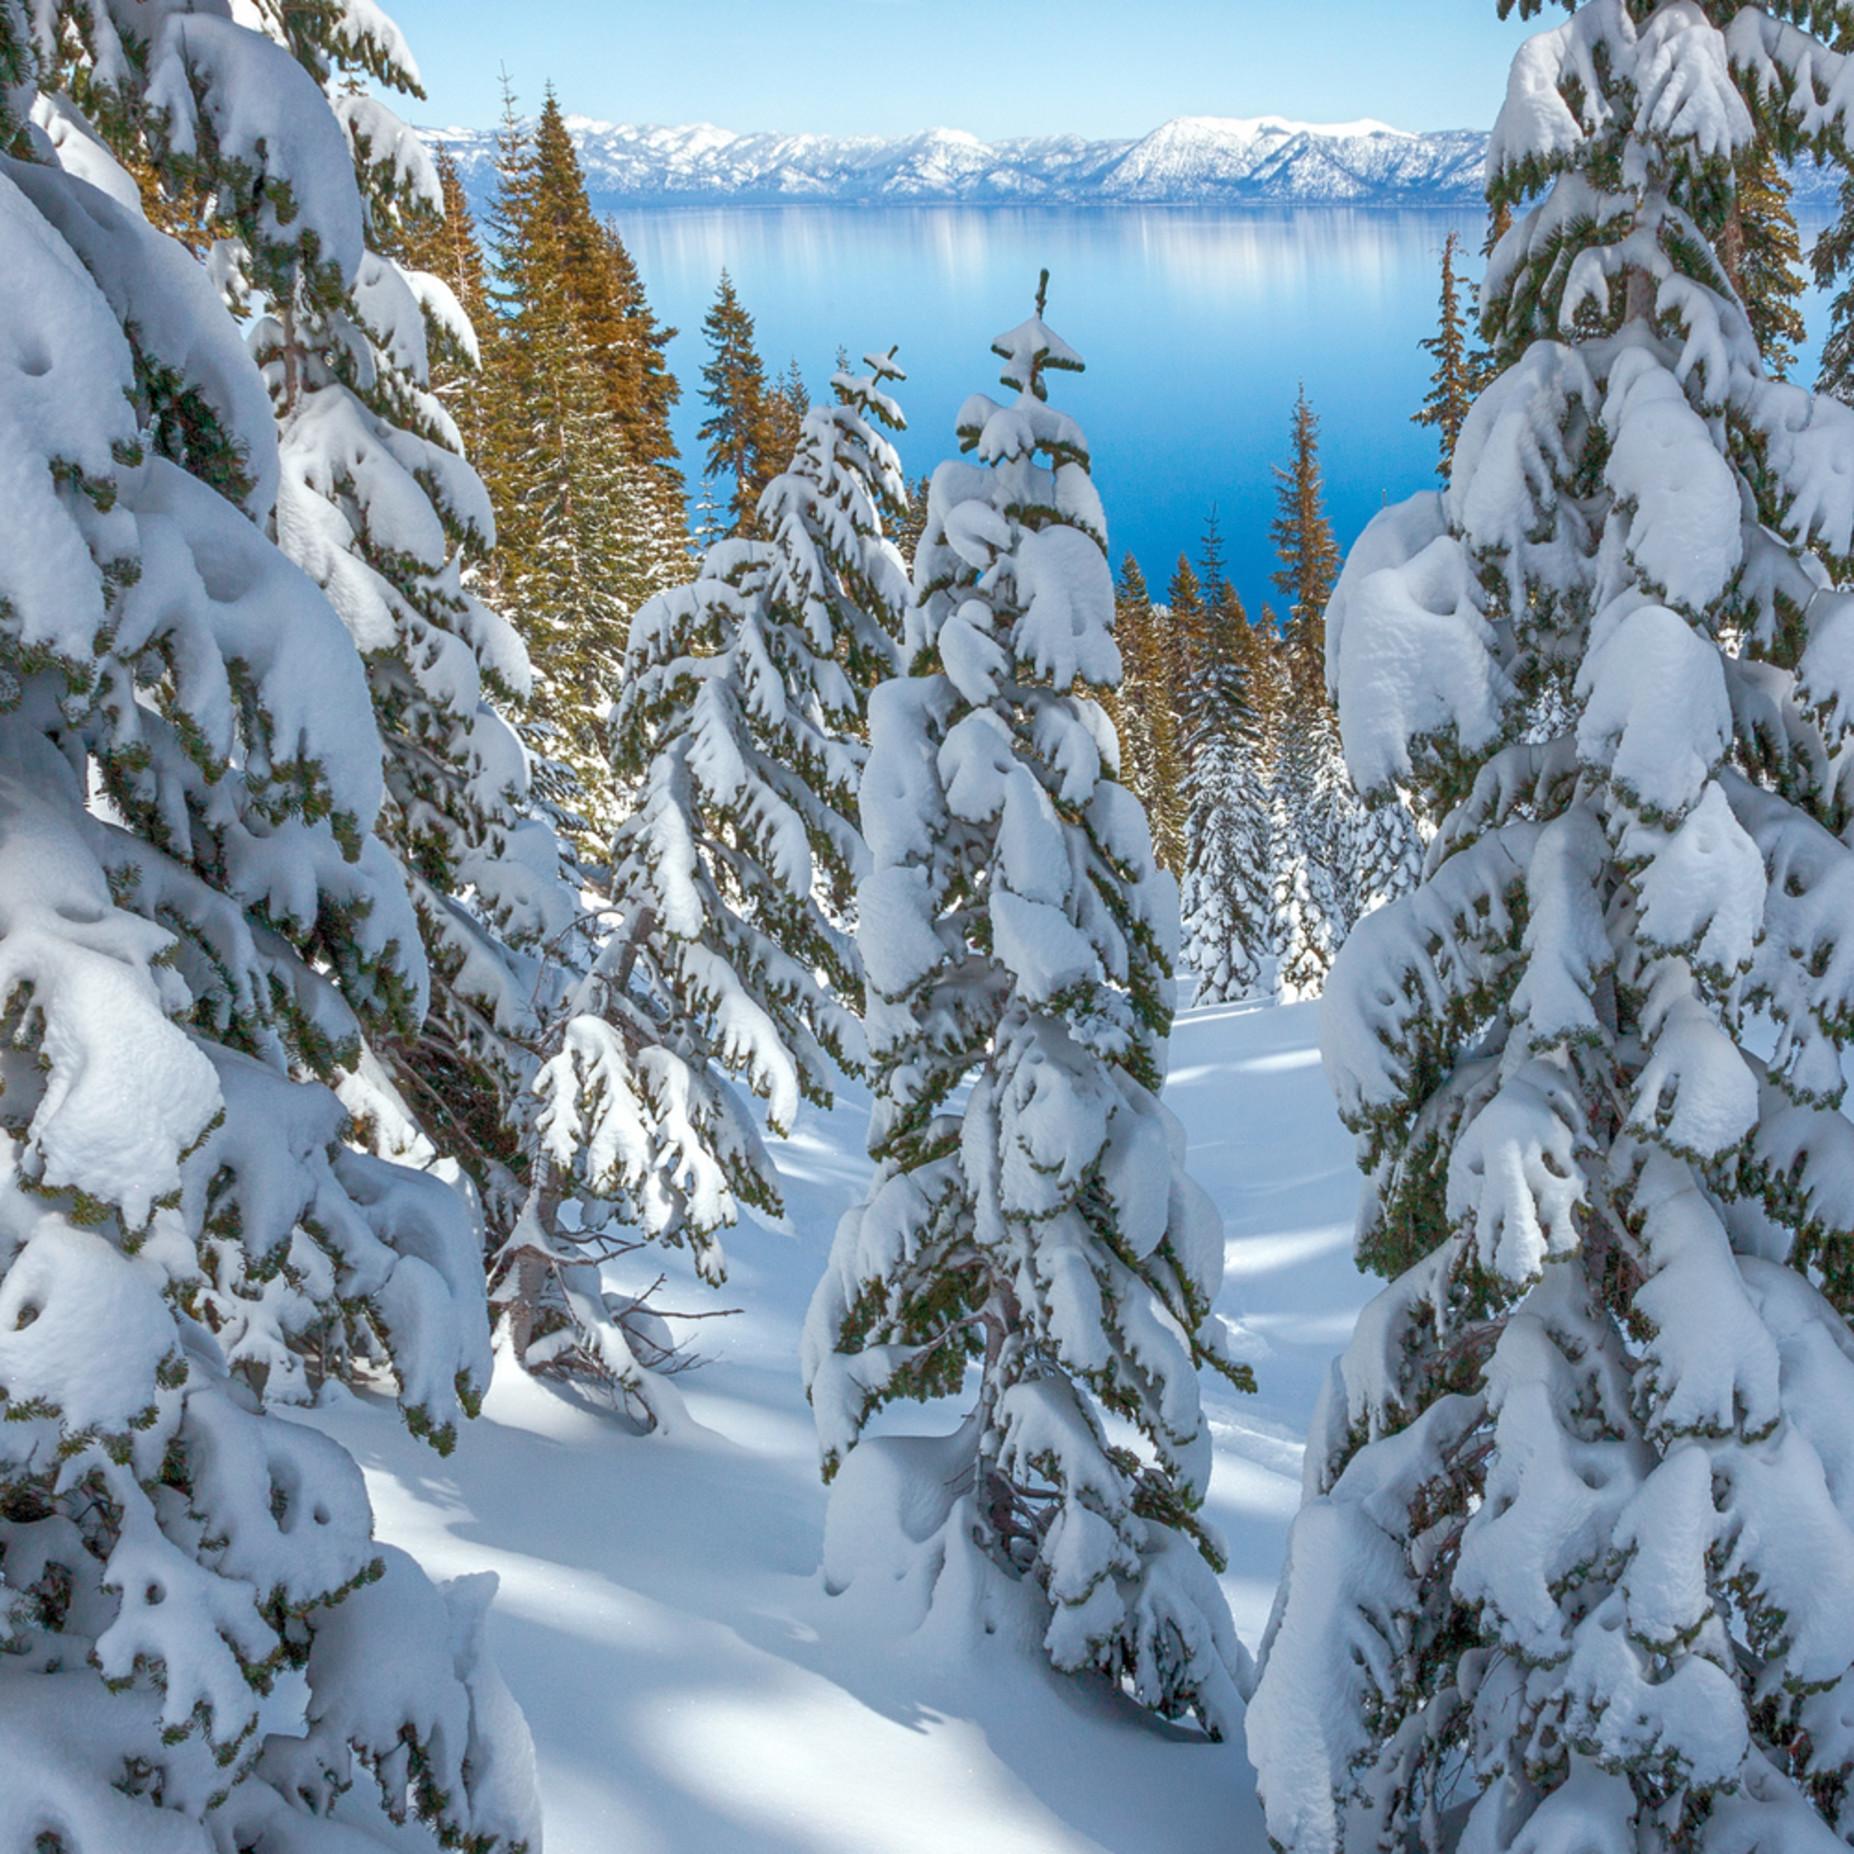 Snowy calm tahoe v zw7xv2